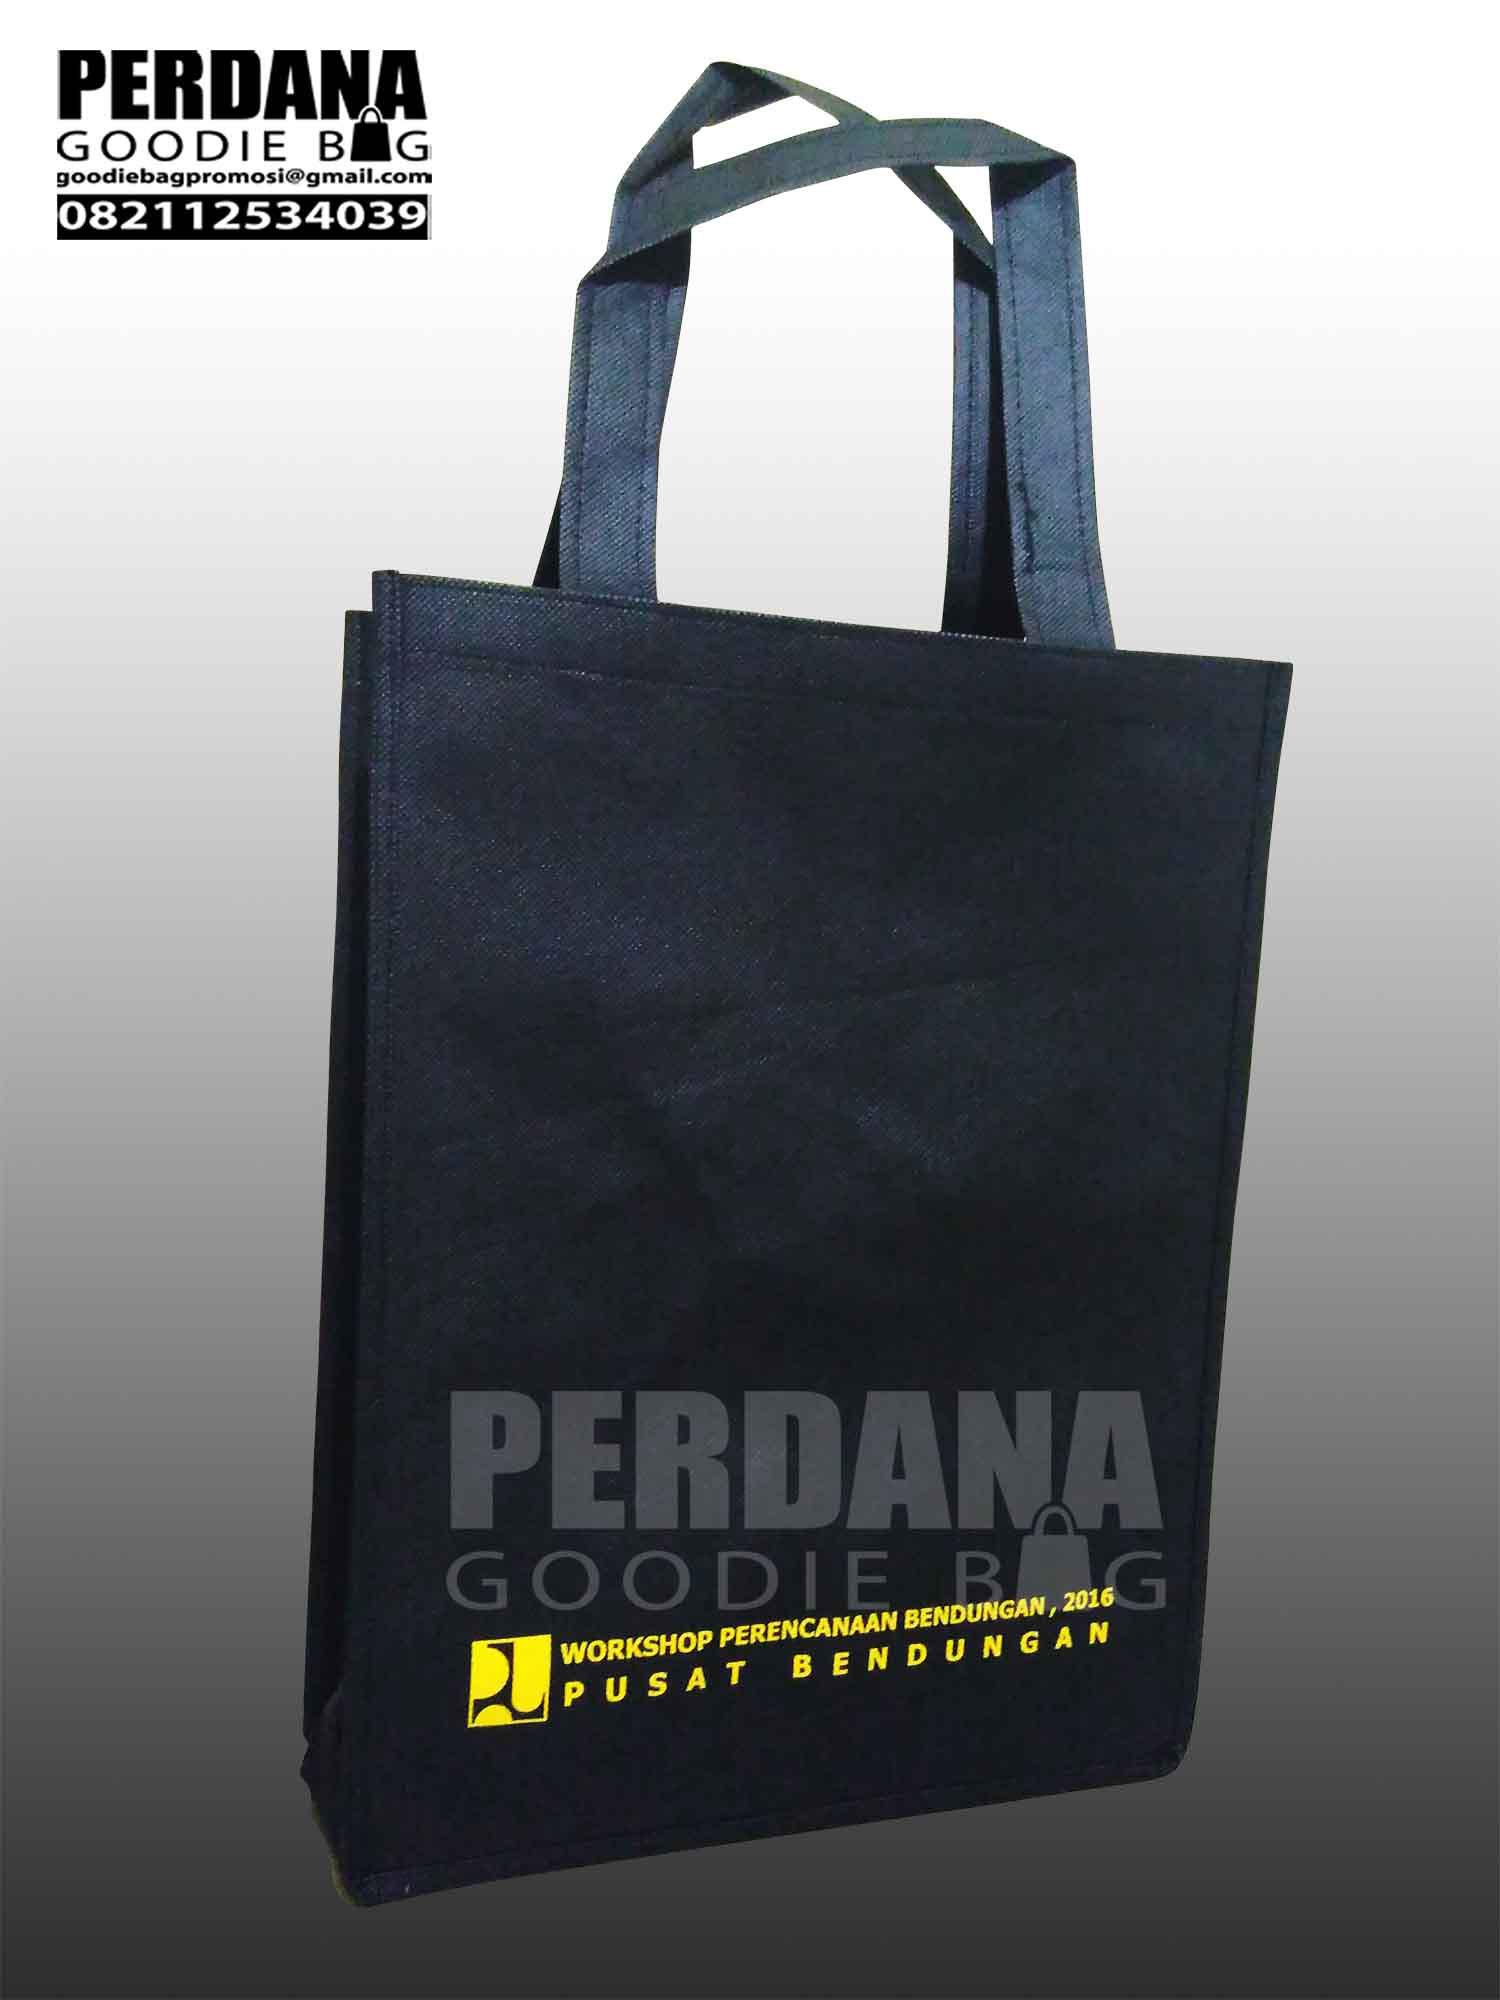 goodiebag spunbond PU produksi Perdana